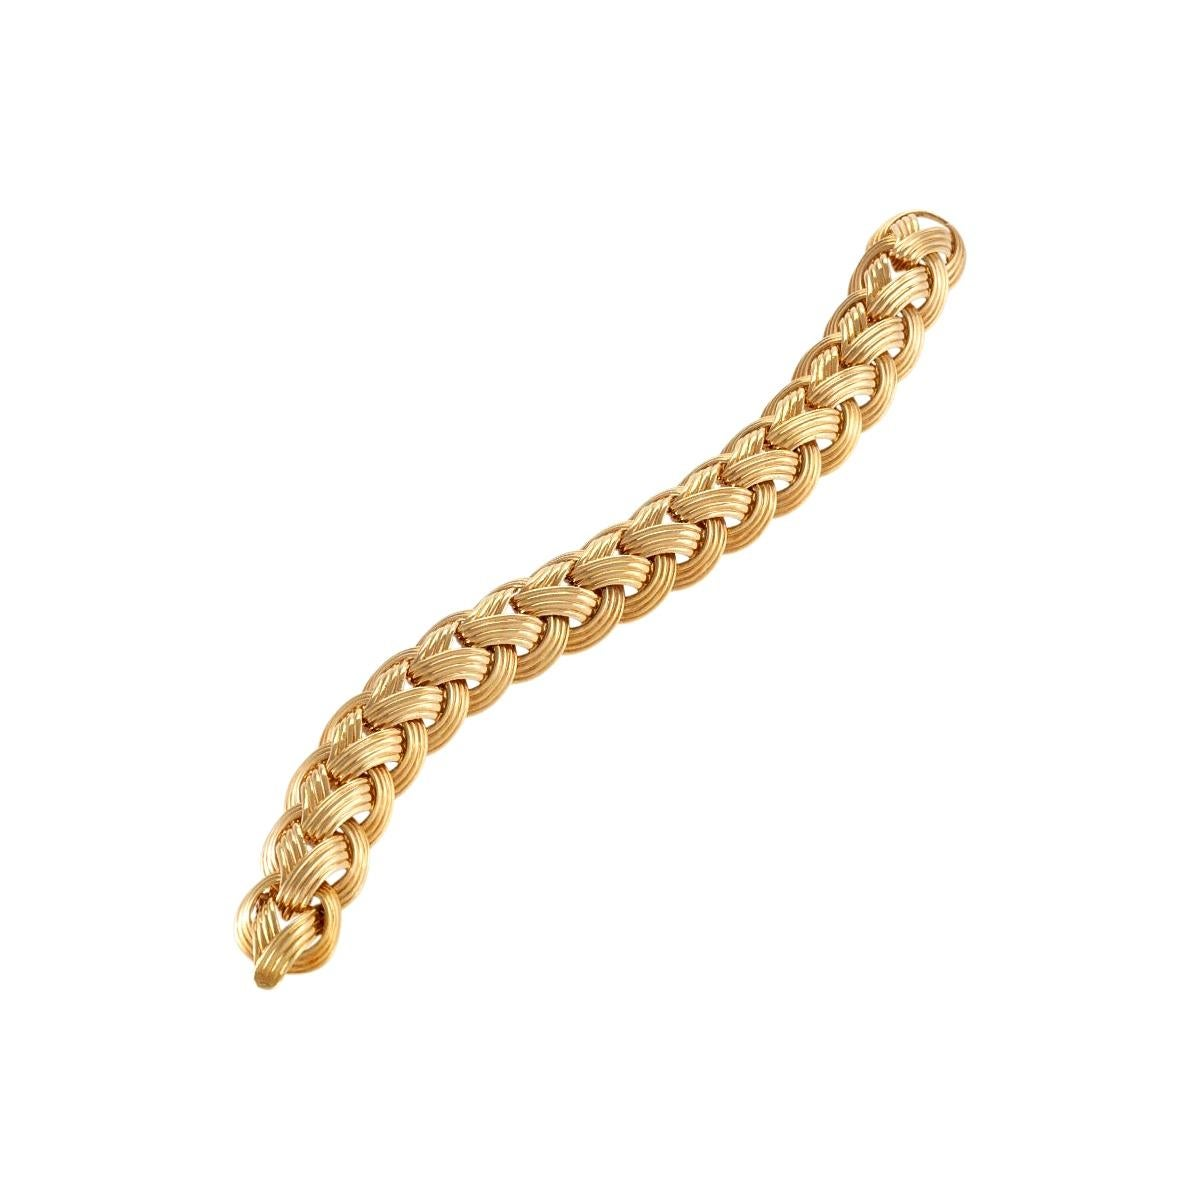 Van Cleef & Arpels Gold Bracelet